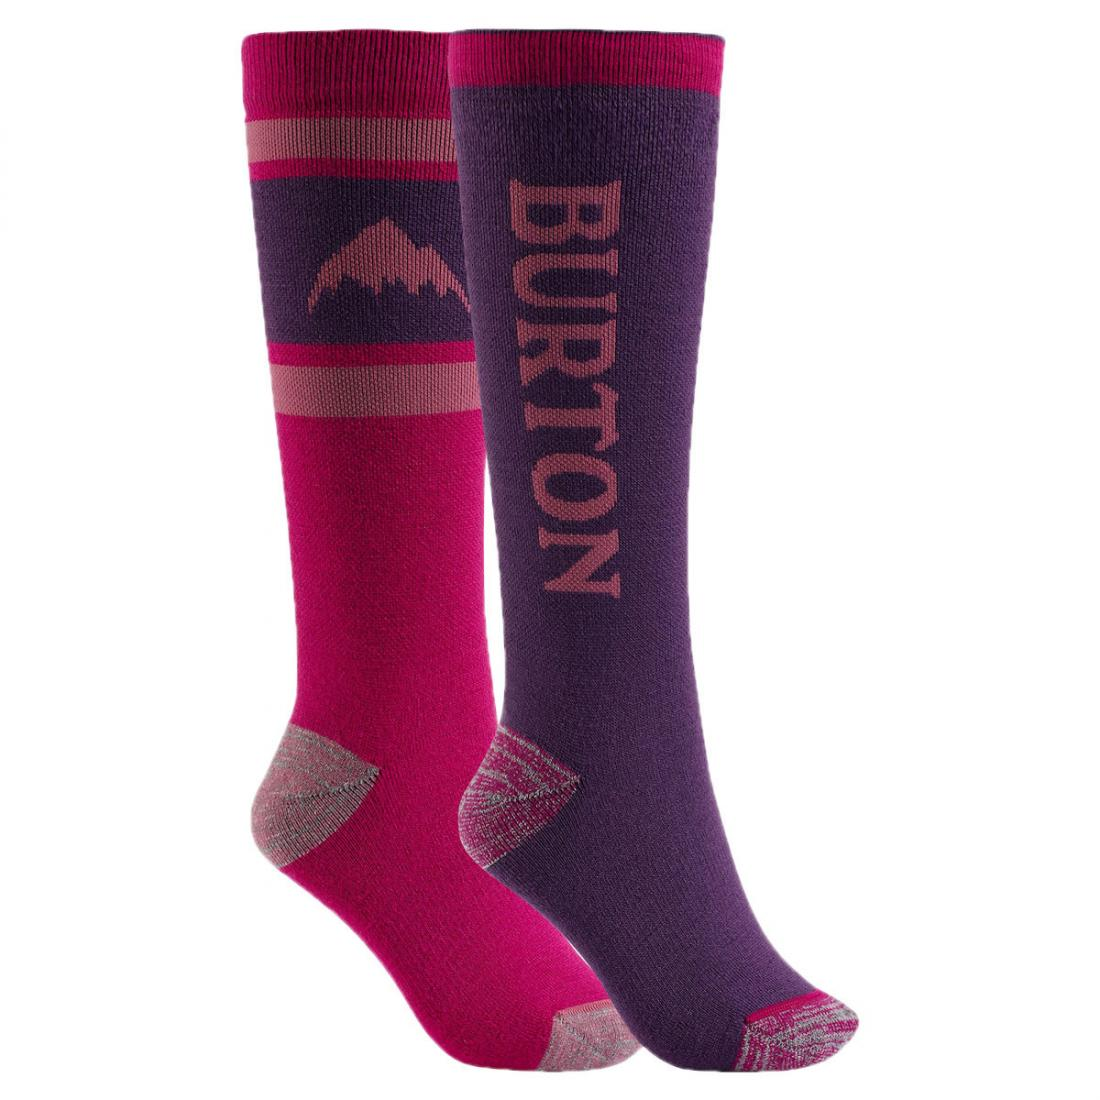 Носки сноубордические Burton Weekend Midweight Snowboard Sock Two-Pack купить в Boardshop №1